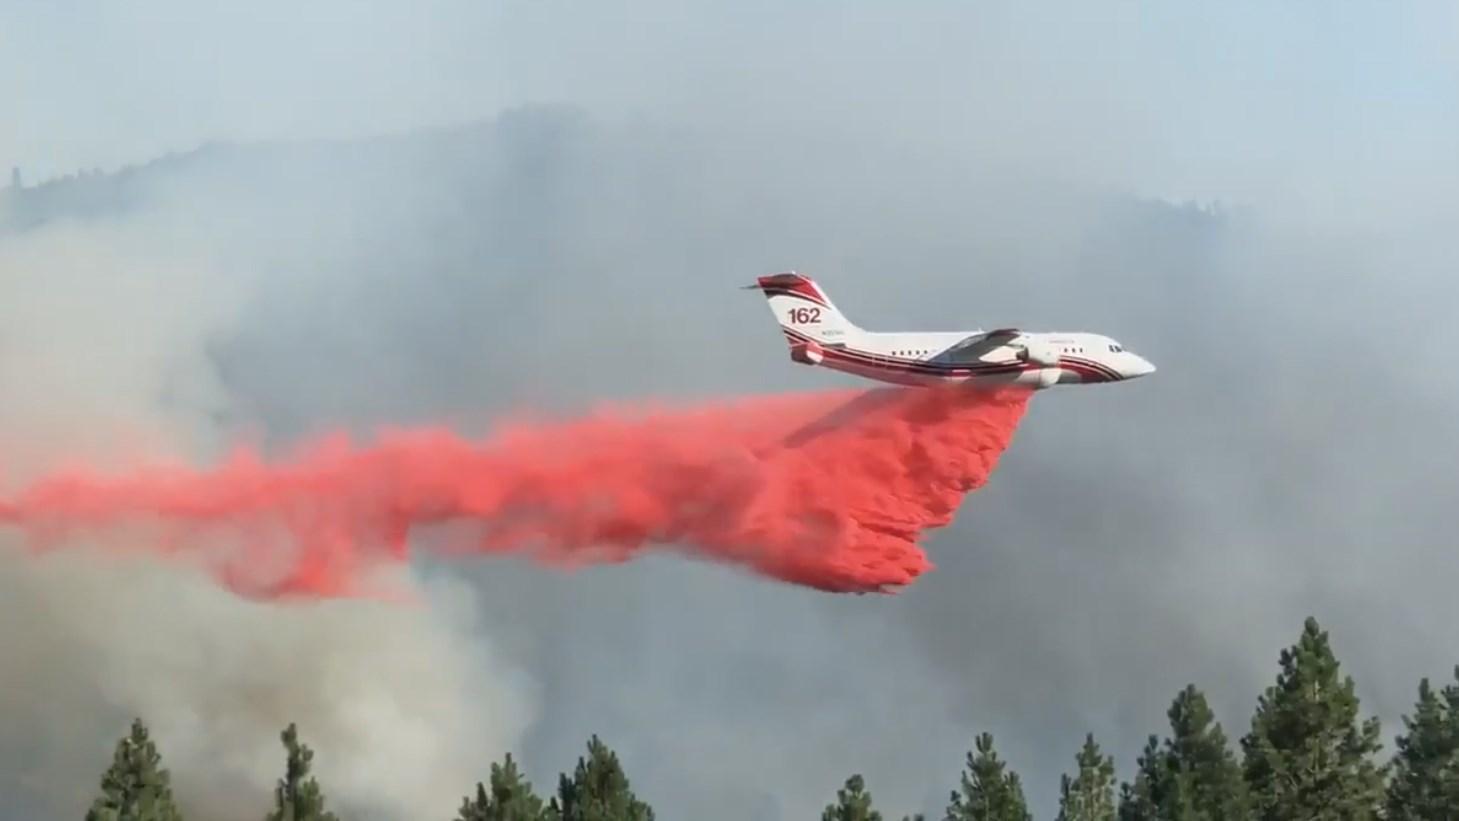 belmont fire - photo #27